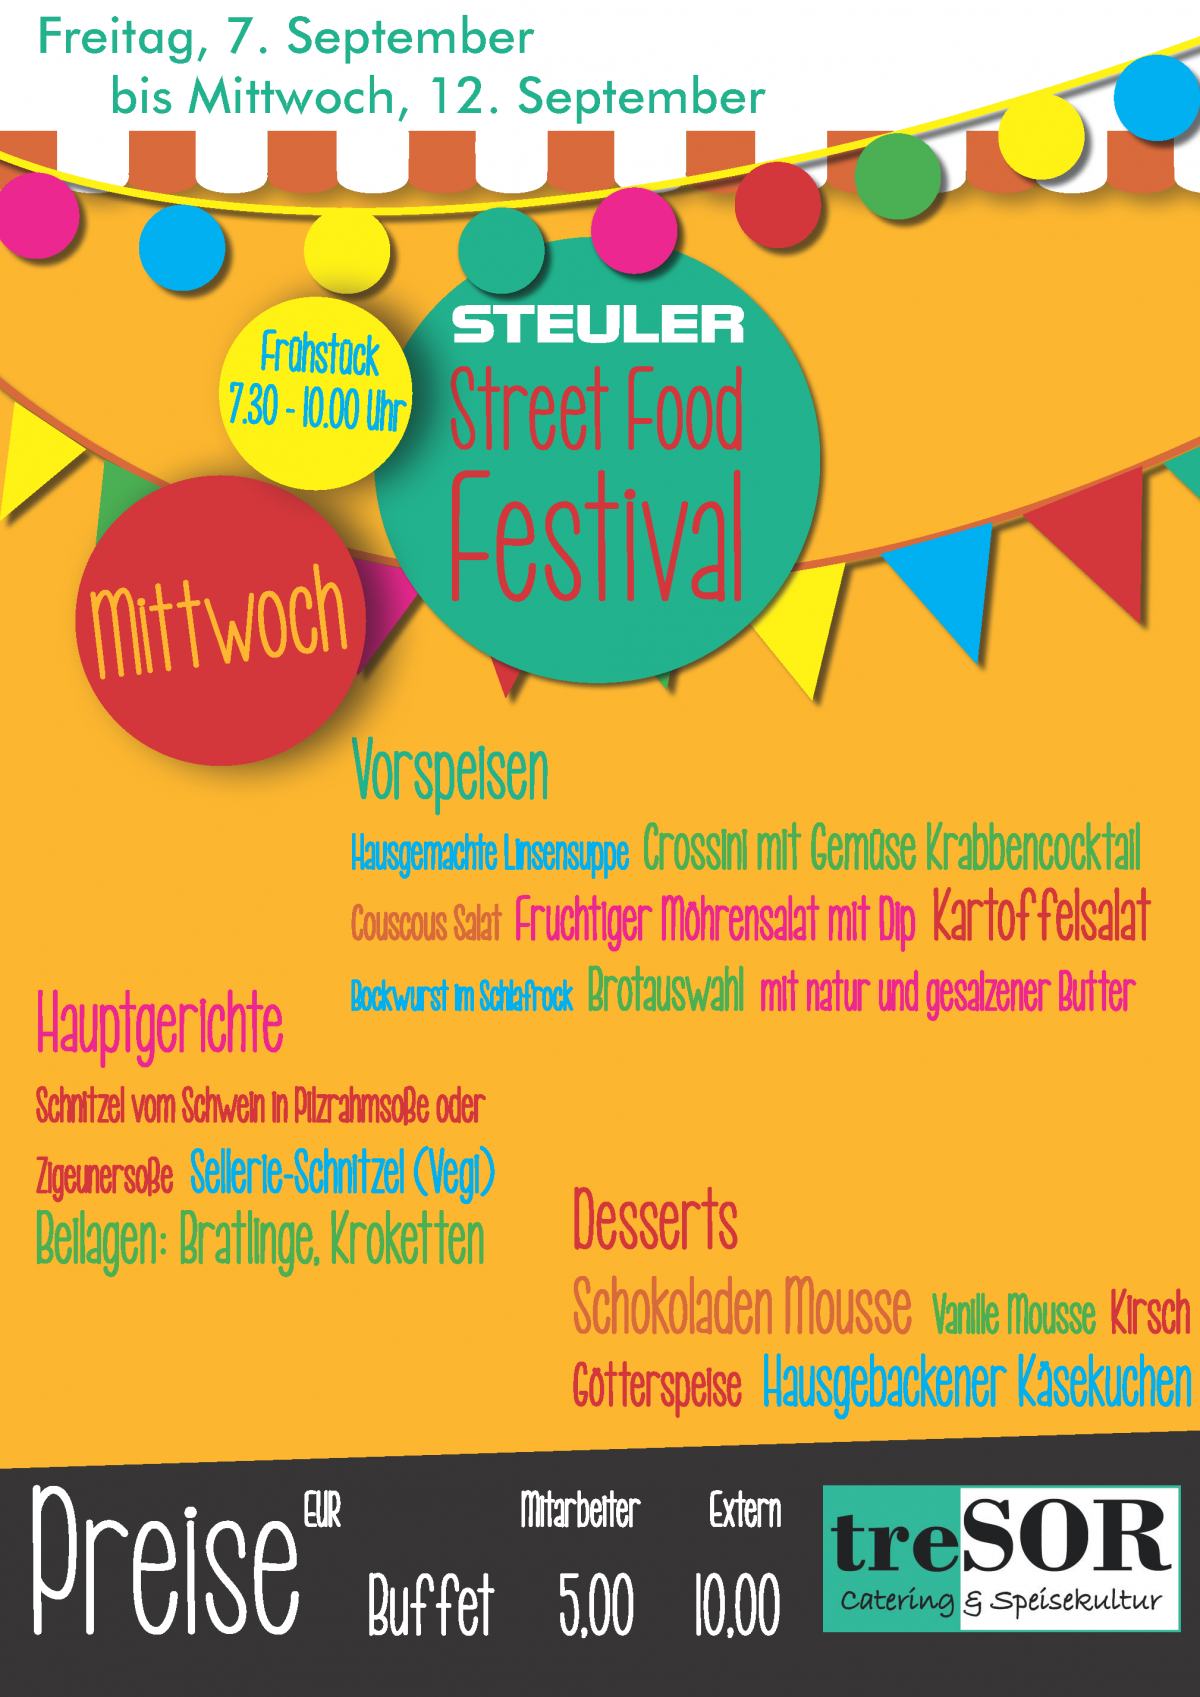 Steuler Street Food Festival 2018-Mittwoch